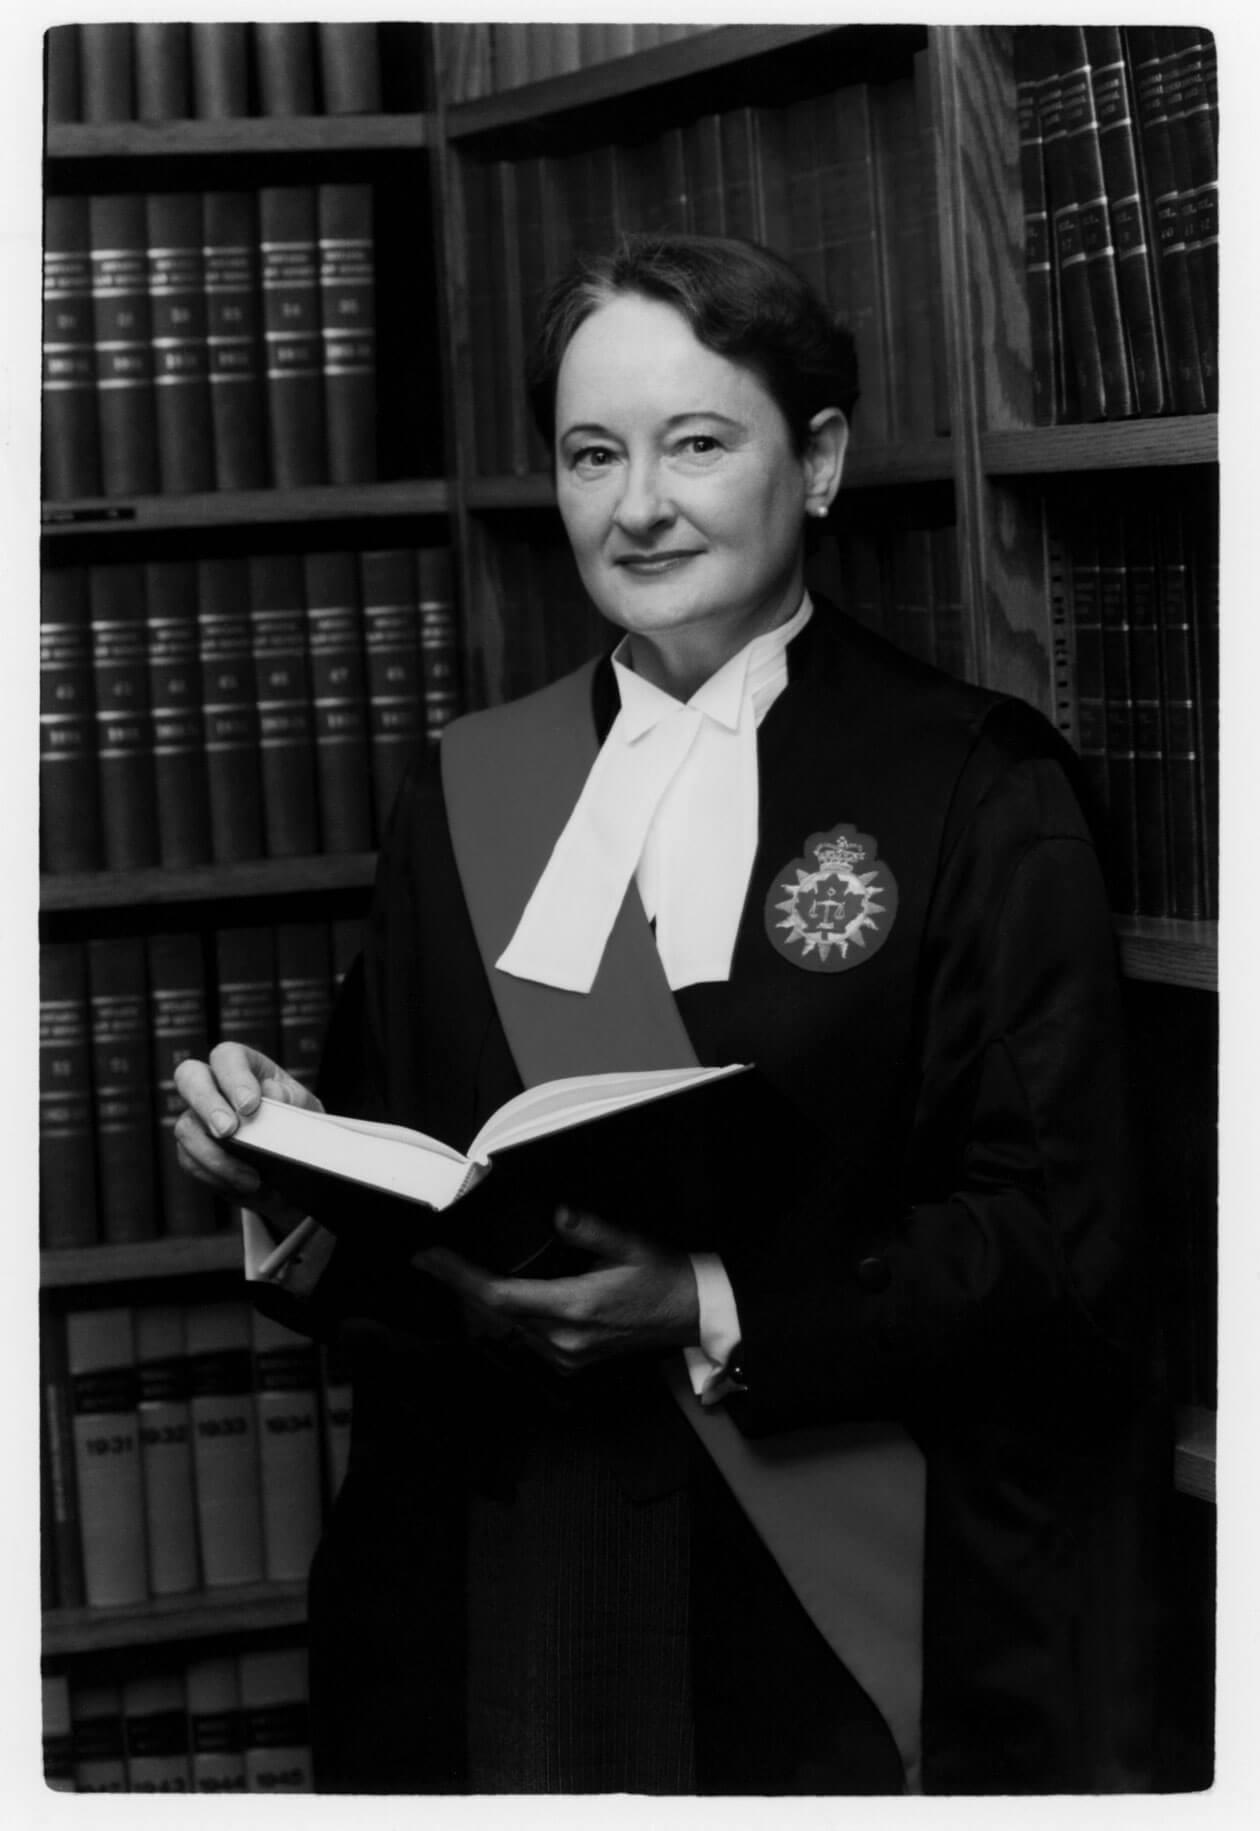 Photograph of MARIE CORBETT